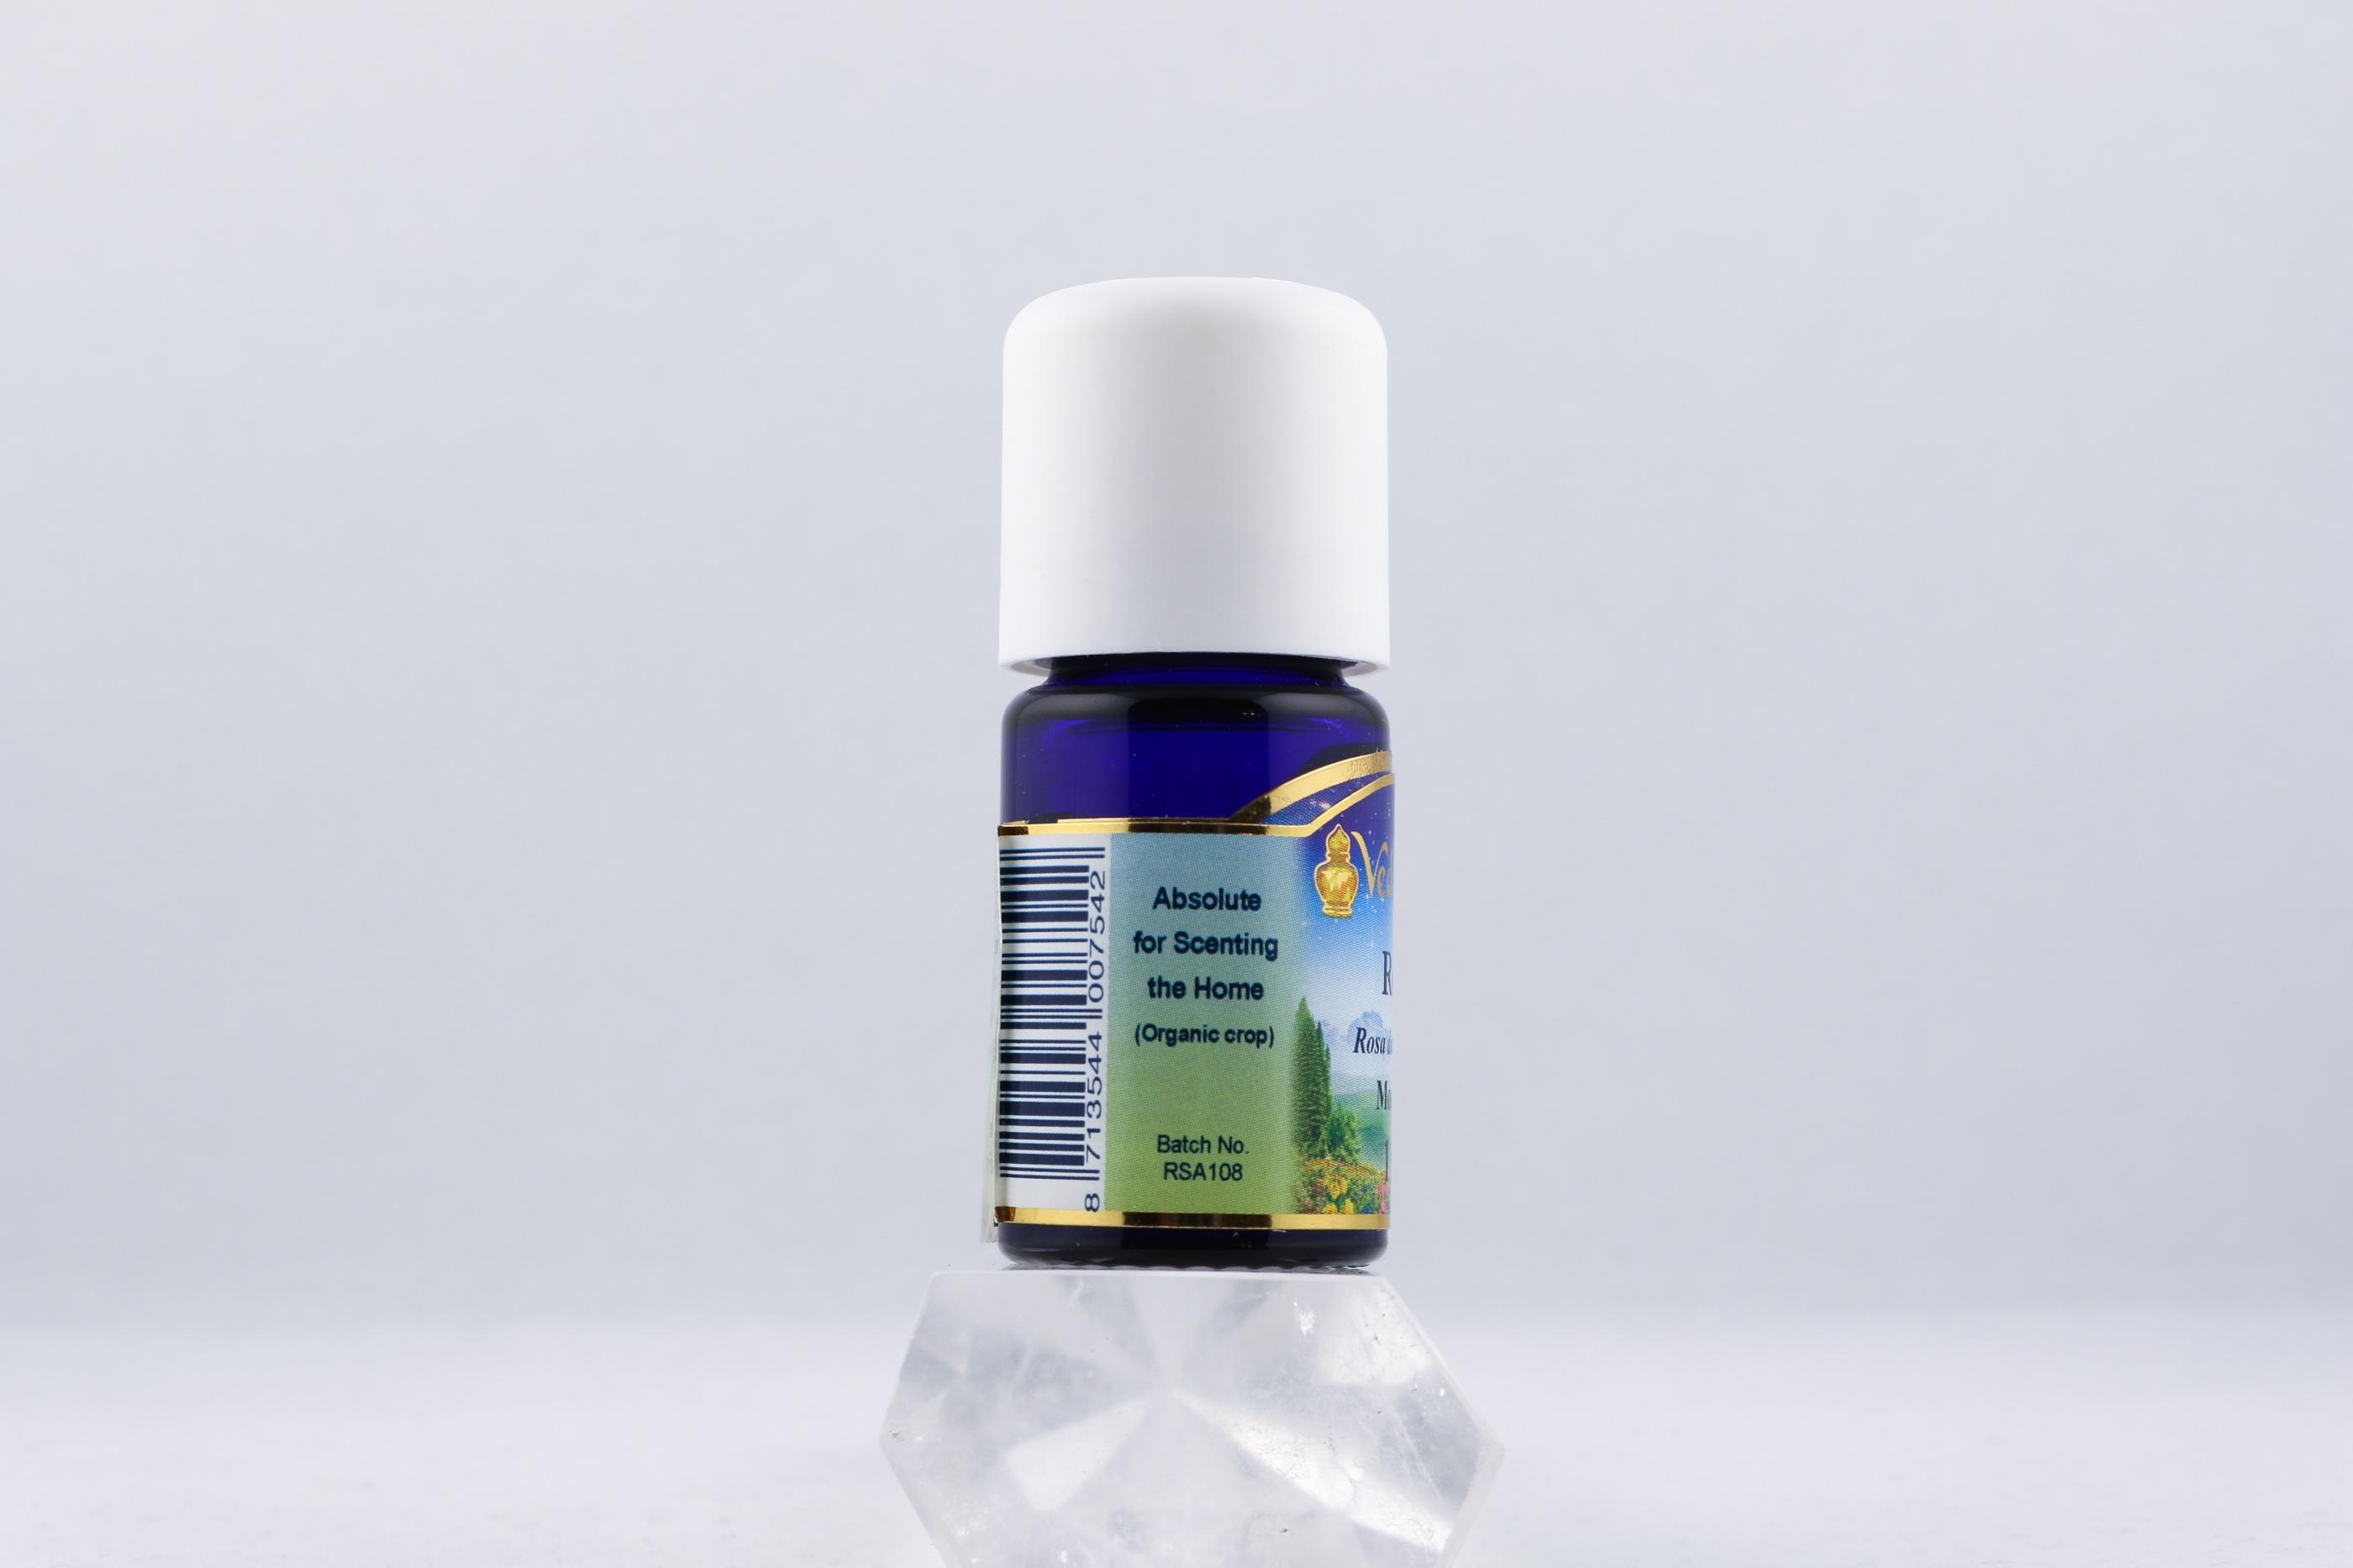 Pine Sylvester olja wellness ayurveda halmstad sweden svensk eterisk aroma olja